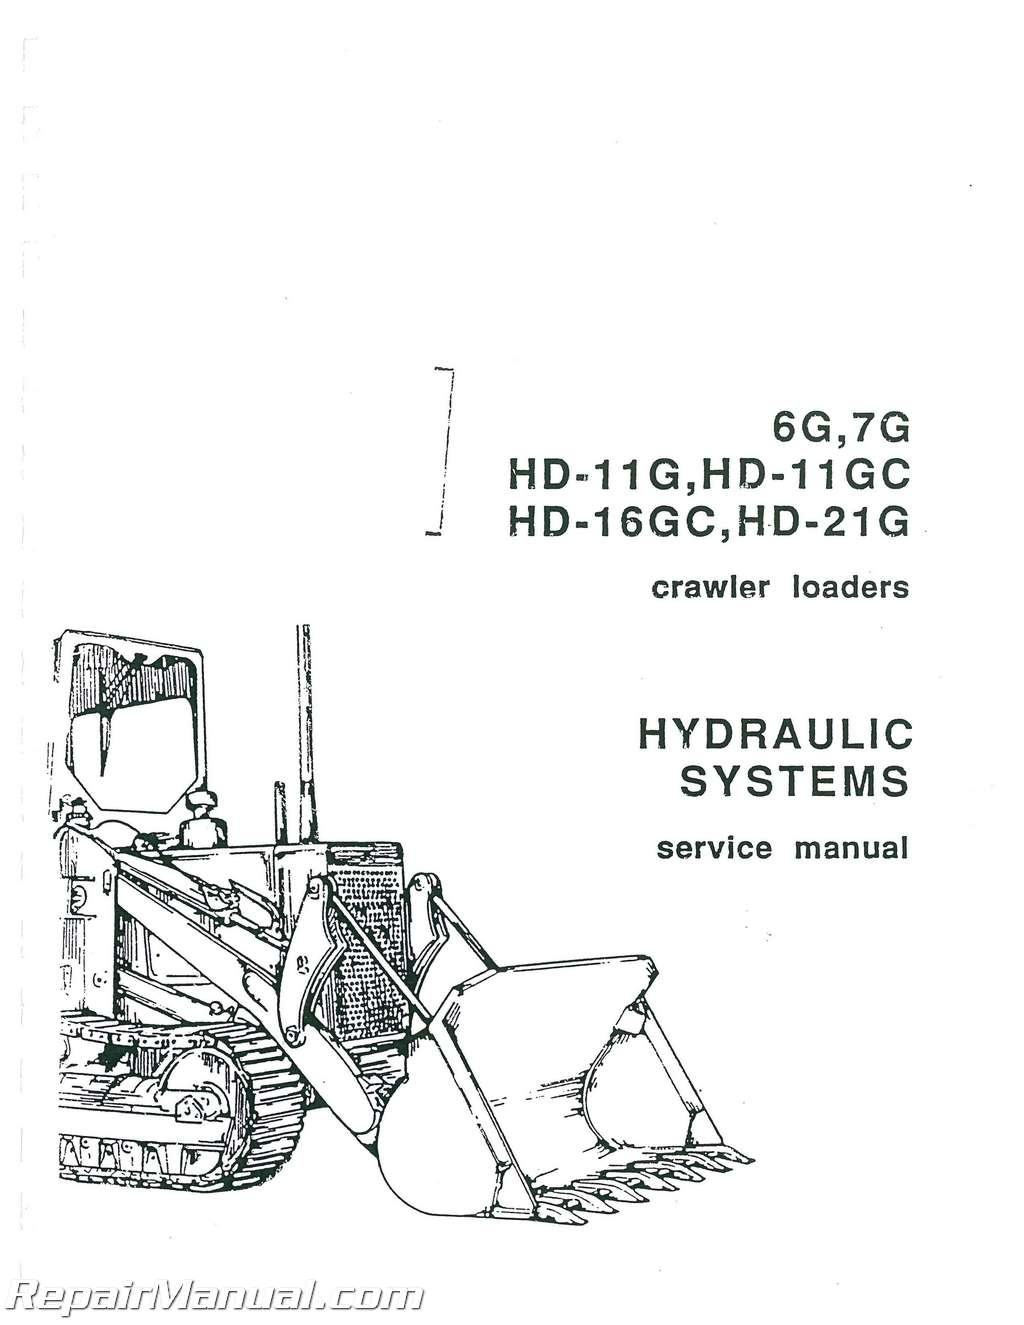 allis chalmers hd 7g diesel crawler loader service manual rh repairmanual com Mahindra Tractor Accessories Mahindra 2615 Tractor